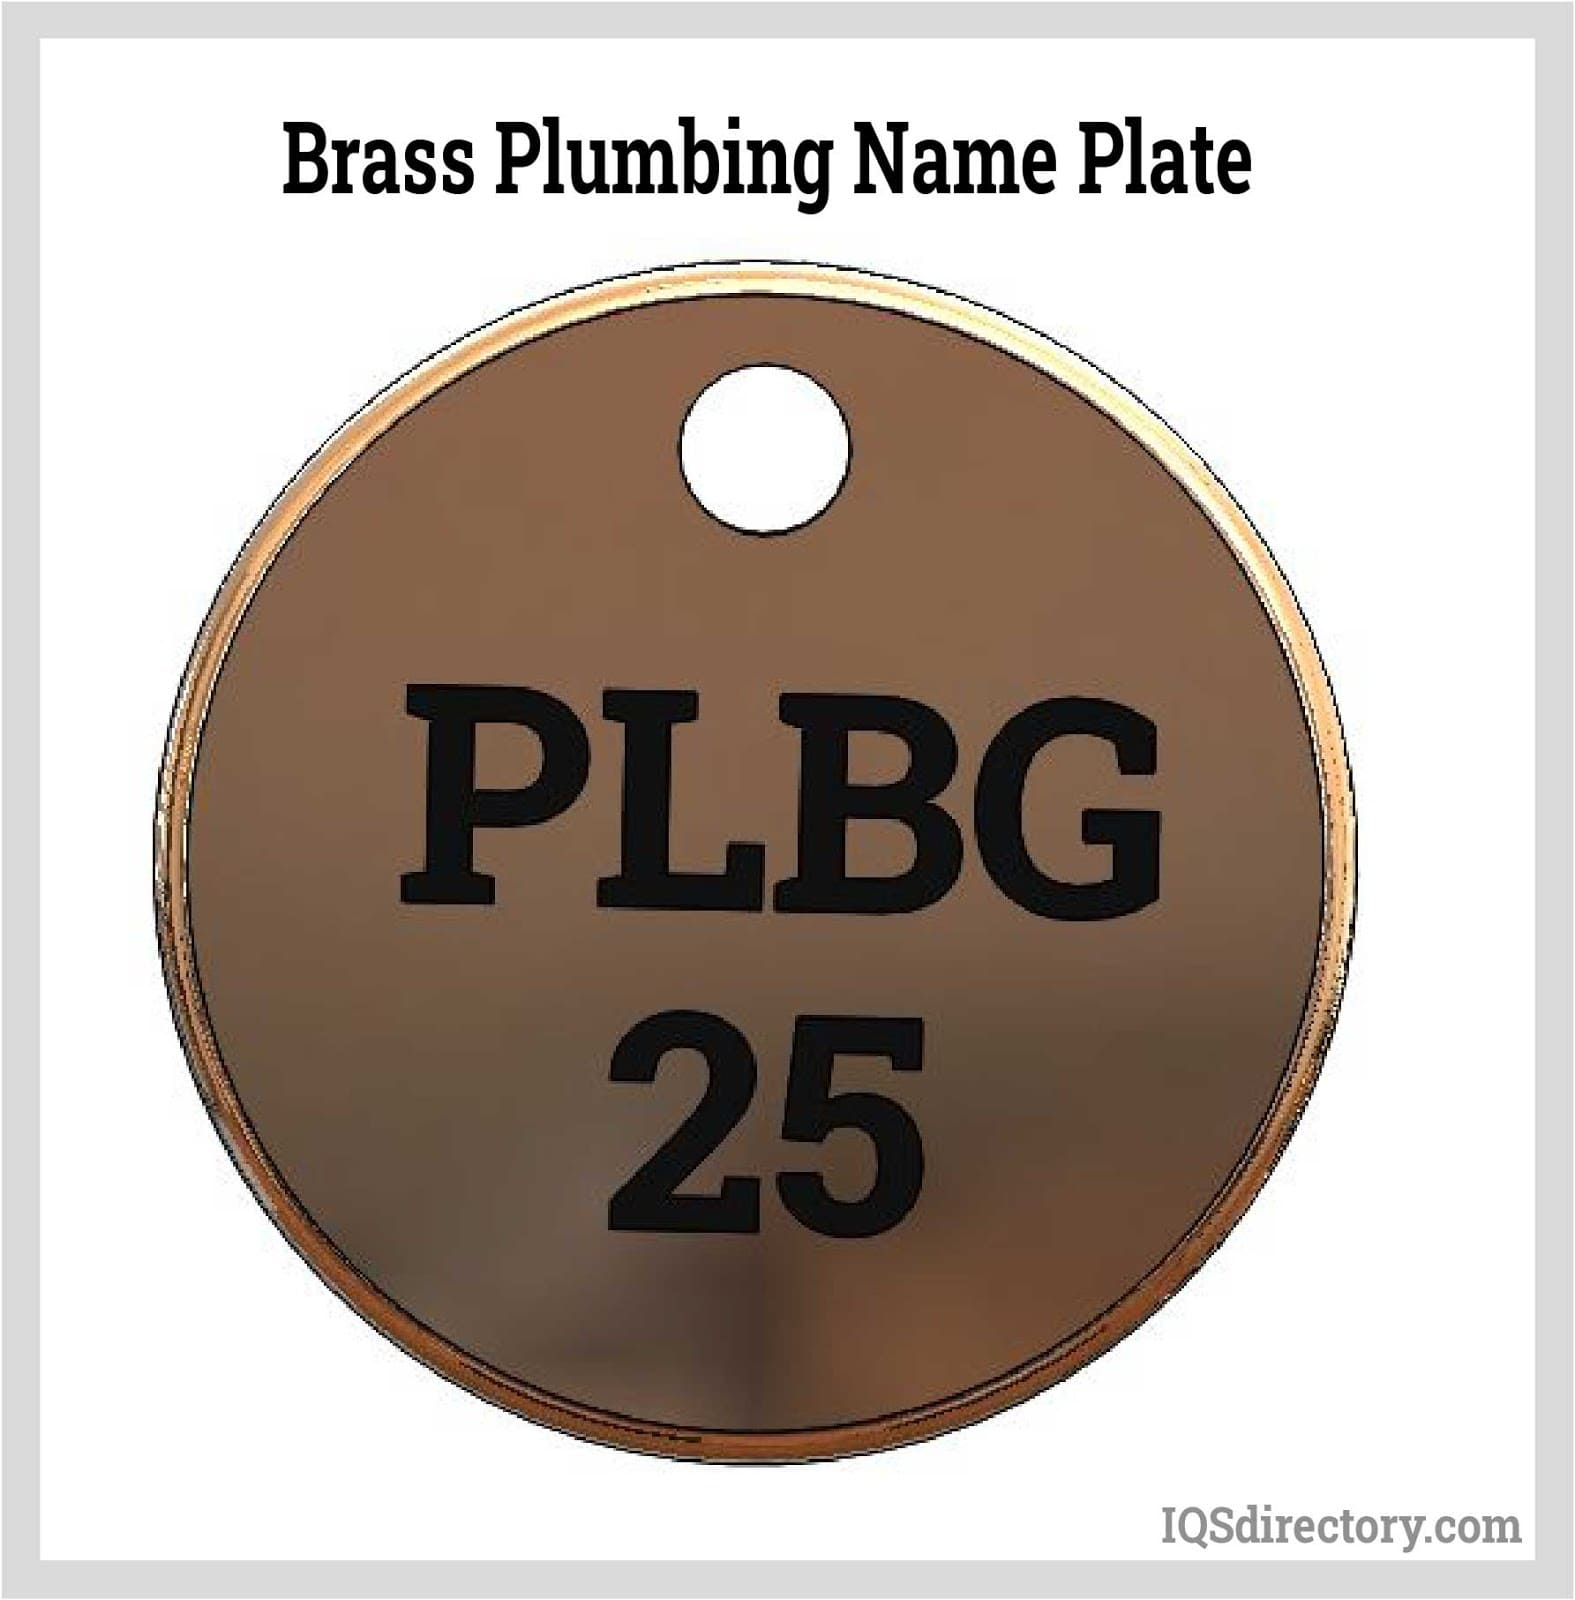 Brass Plumbing Name Plate